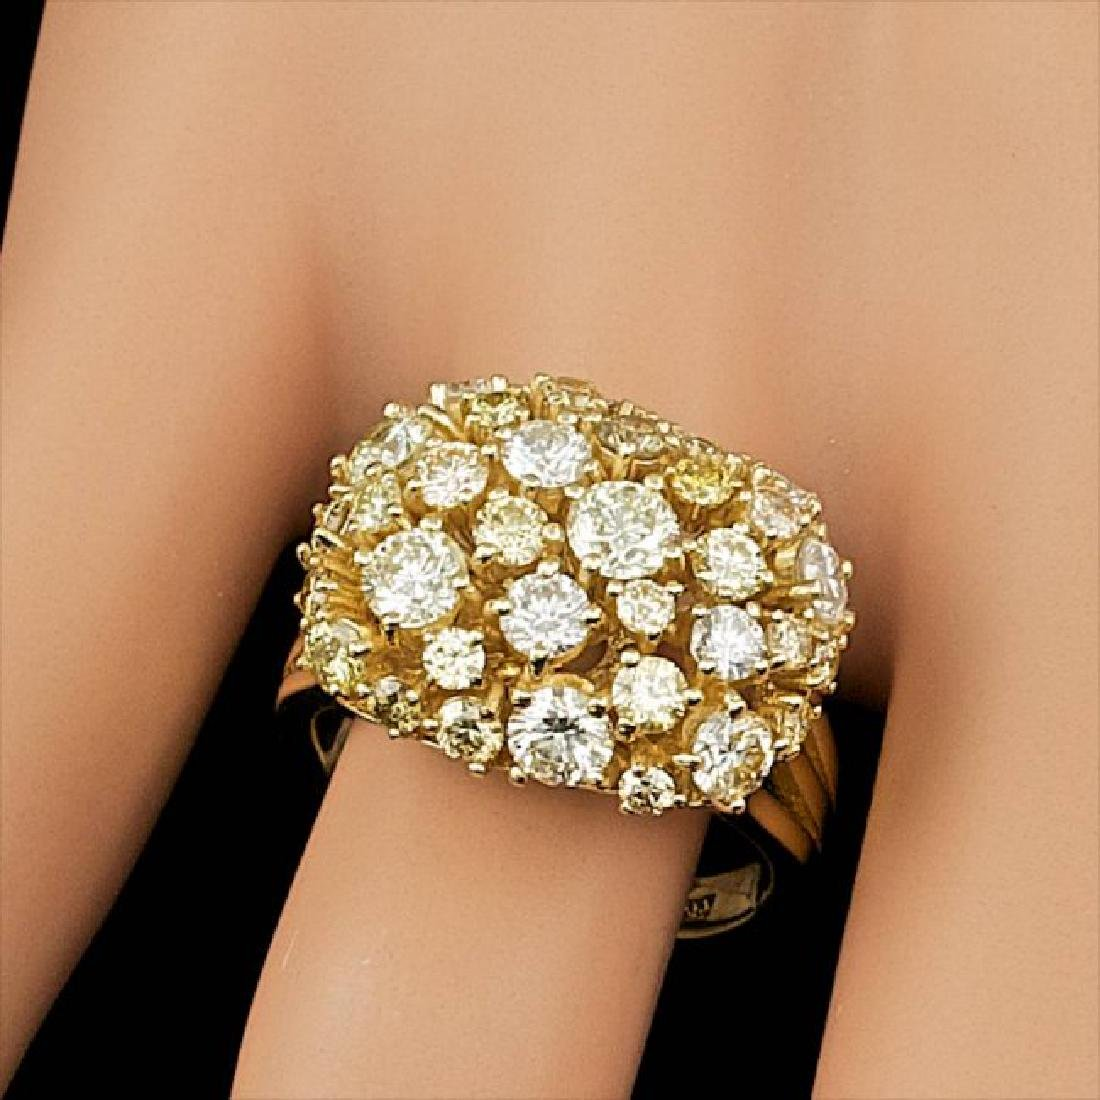 14k Yellow Gold 3.10ct Diamond Ring - 4